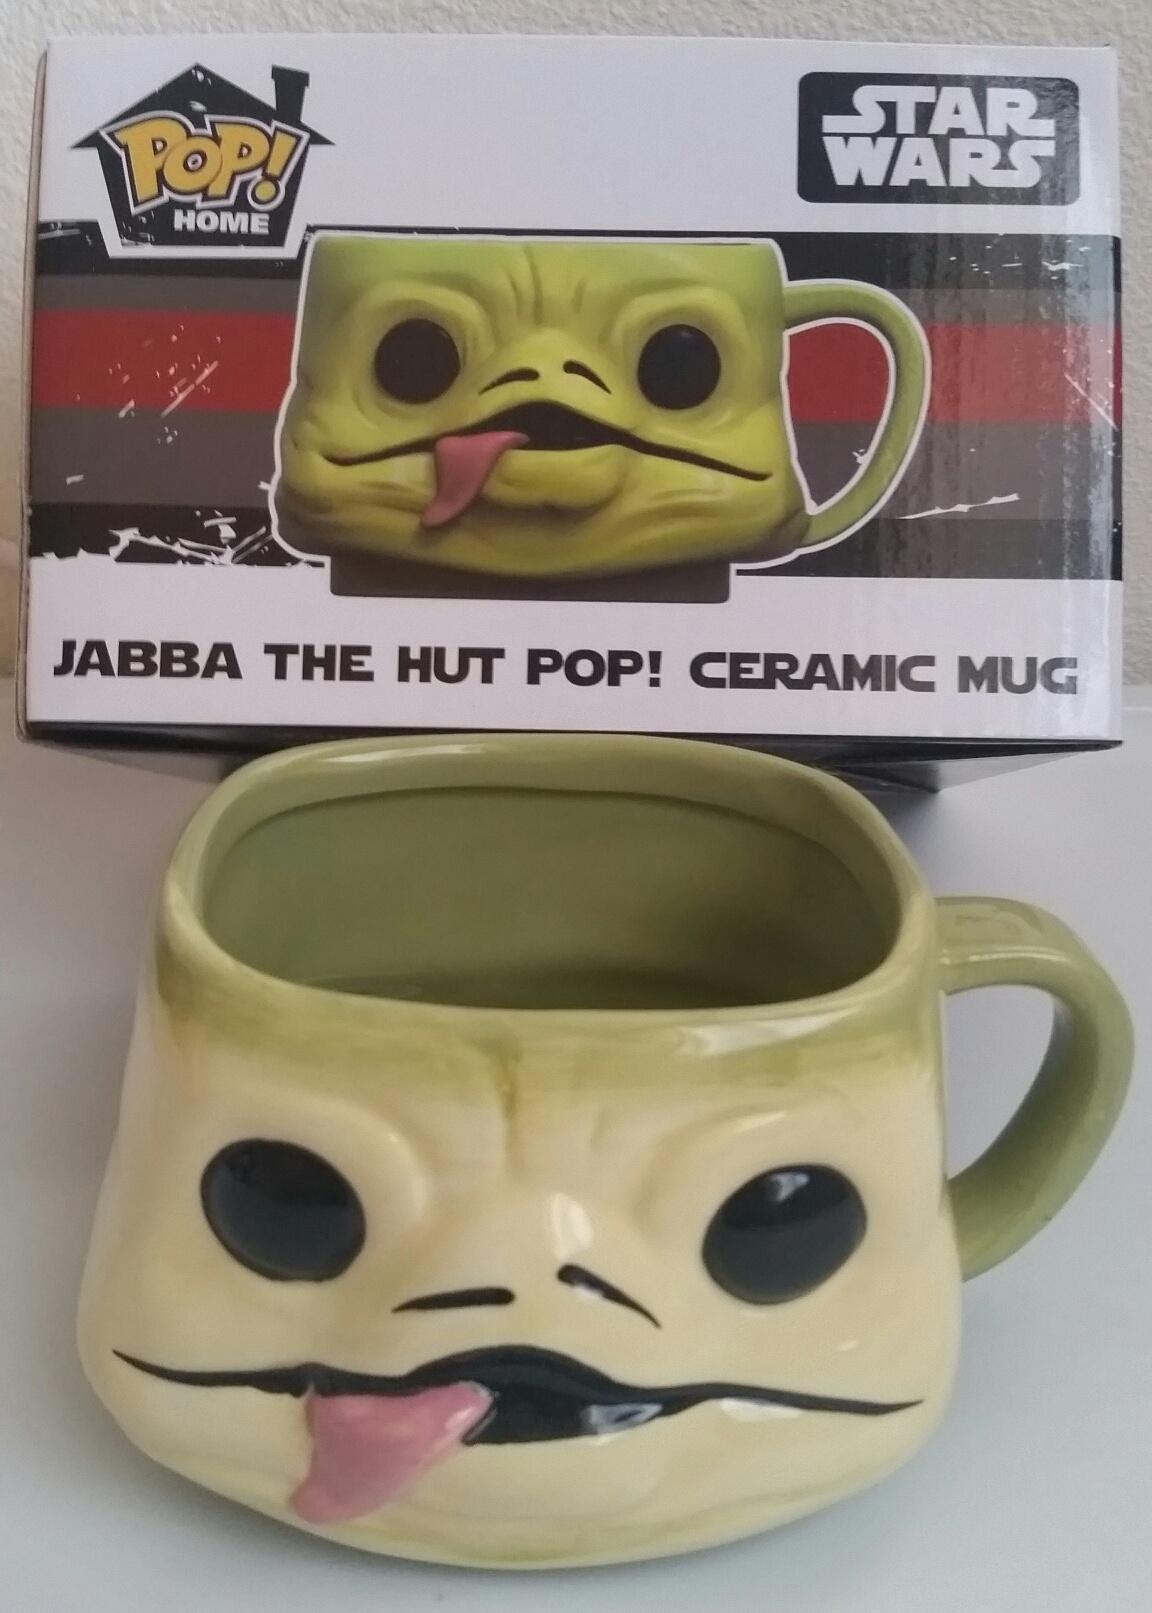 Jabba Pop! Home mug